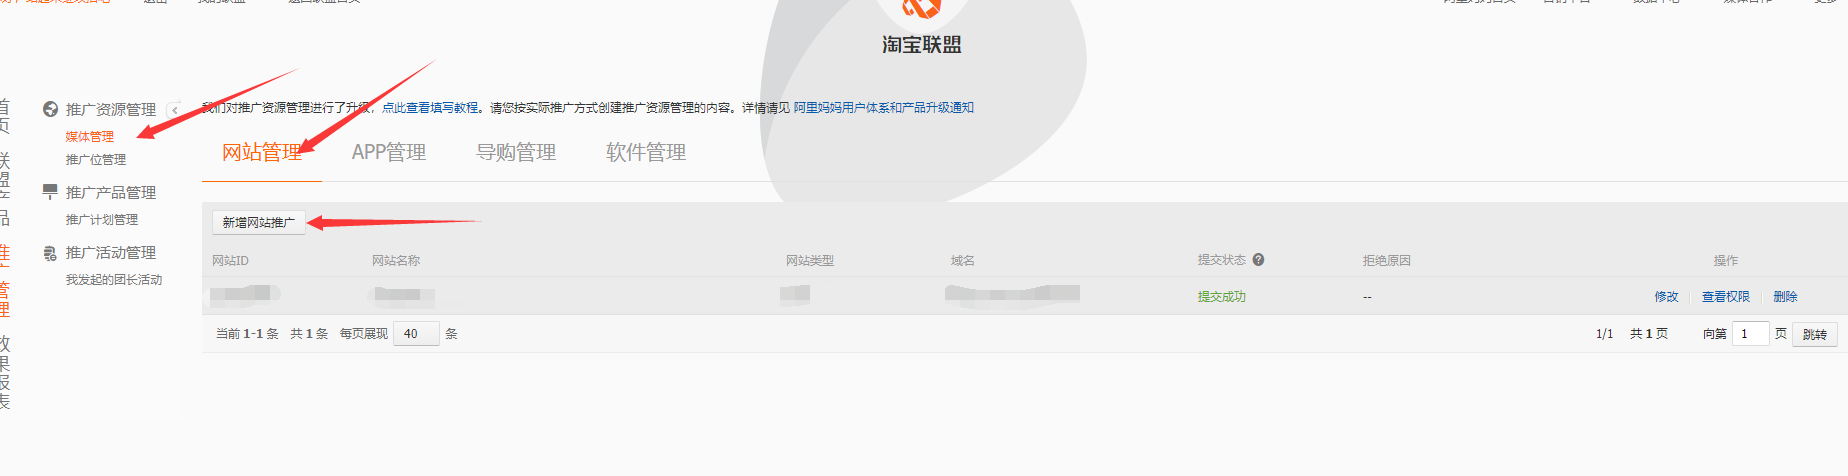 网站推广.png